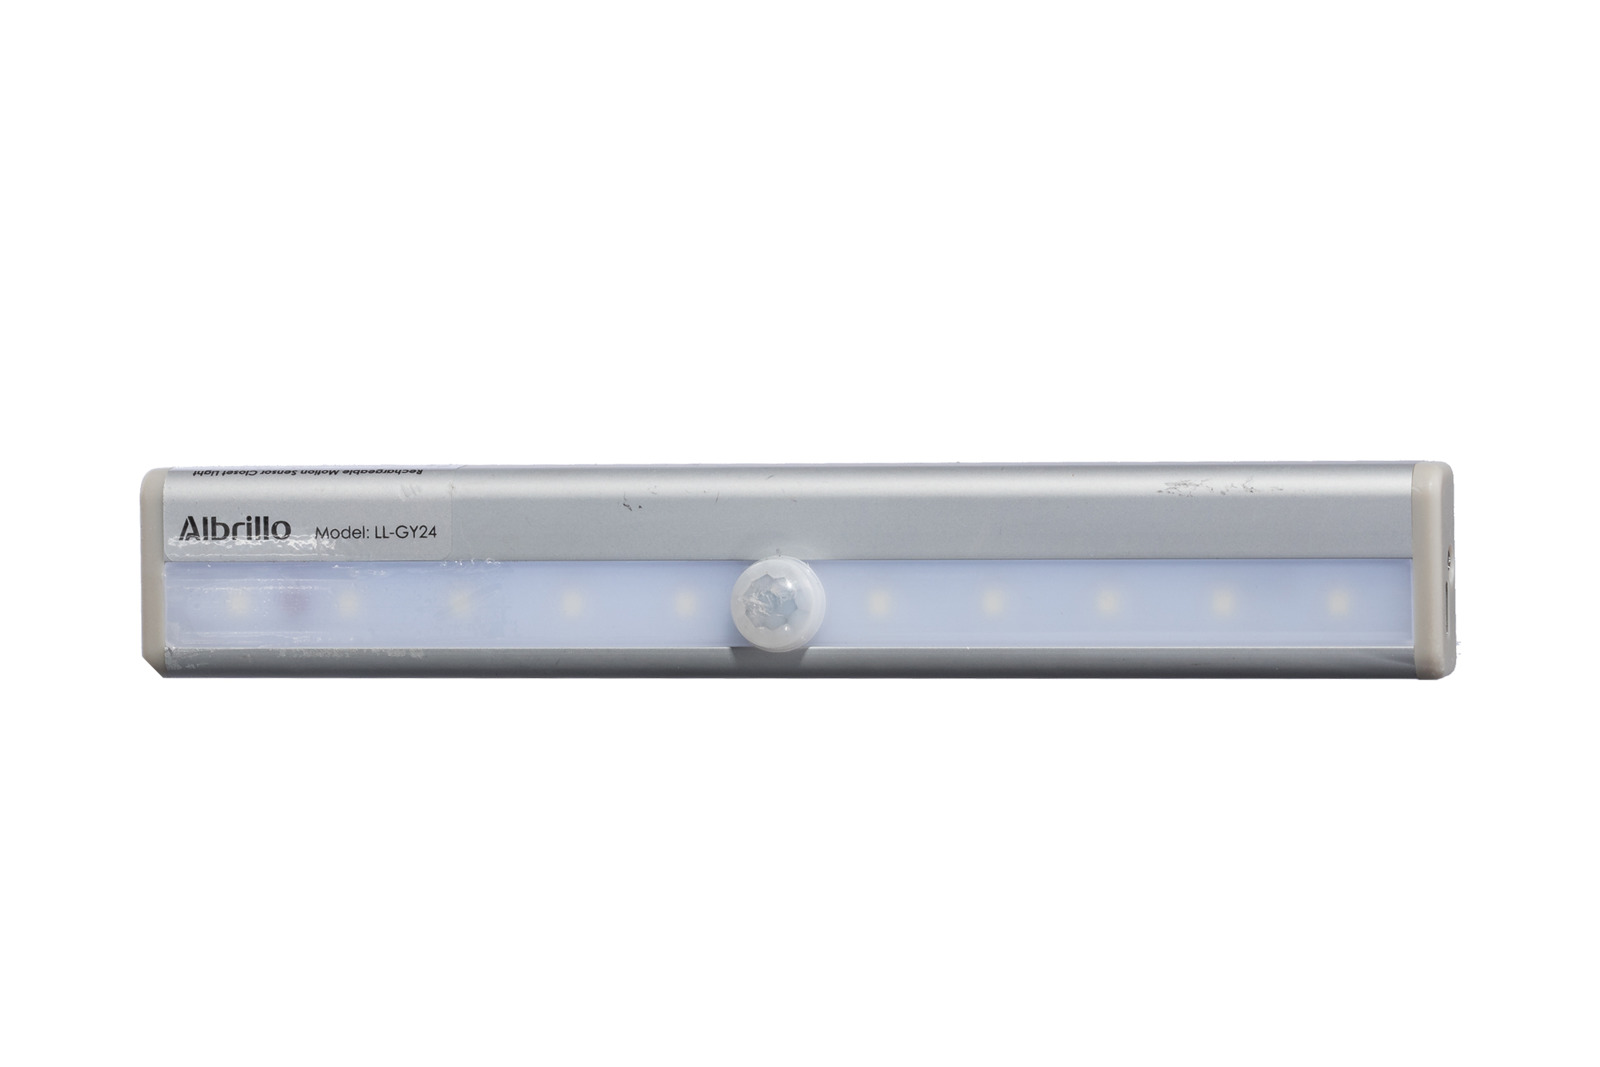 Albrillo LL-GY24 Lampka LED z czujnikiem ruchu